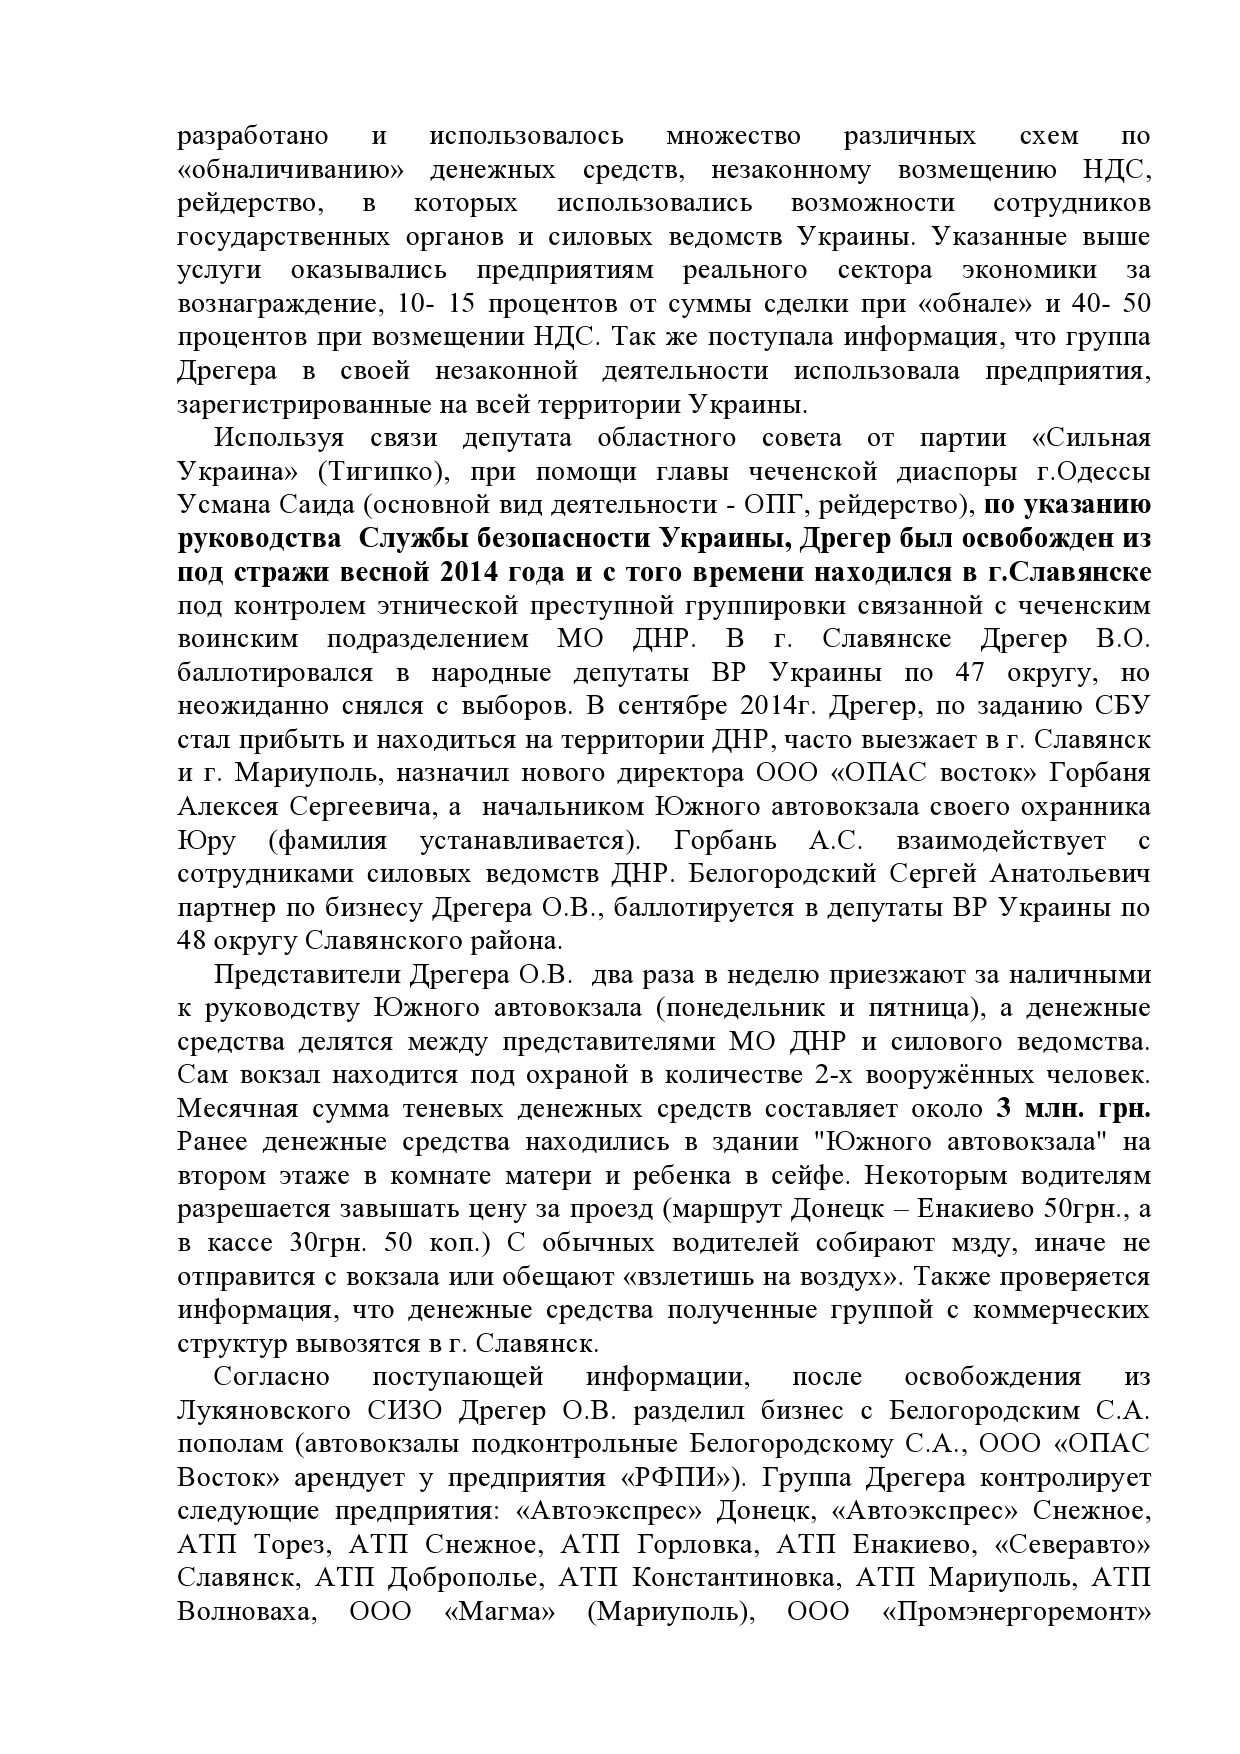 https://b0ltai.files.wordpress.com/2015/09/page0005.jpg